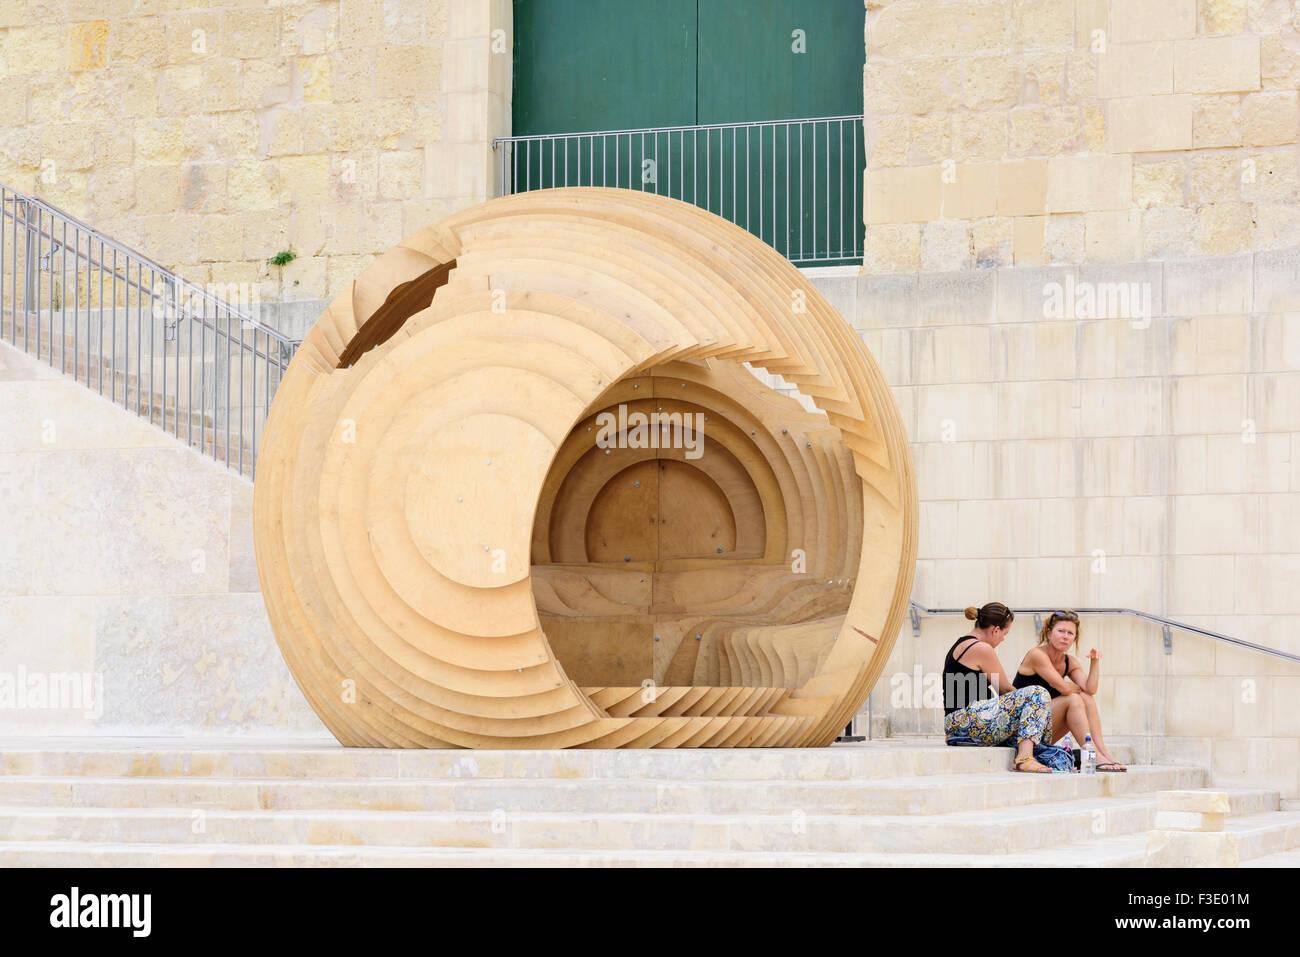 City Gate Valletta - Stock Image